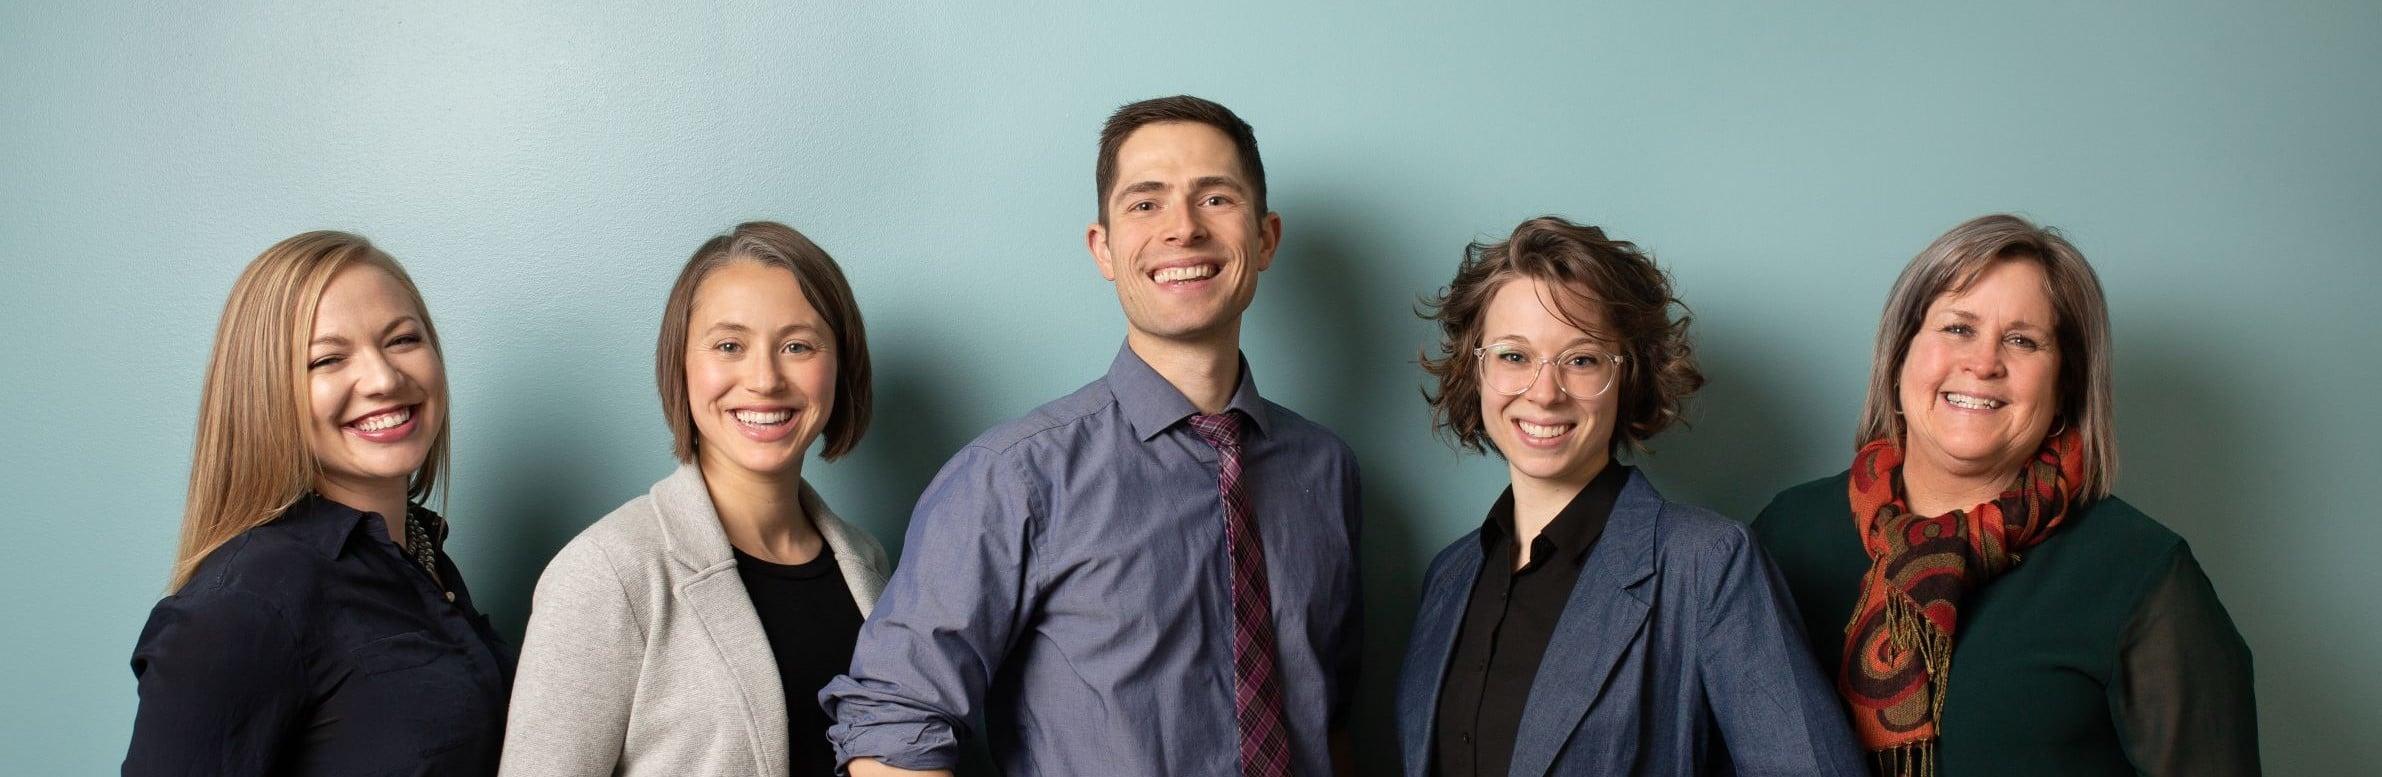 Capital Chiropractic Team